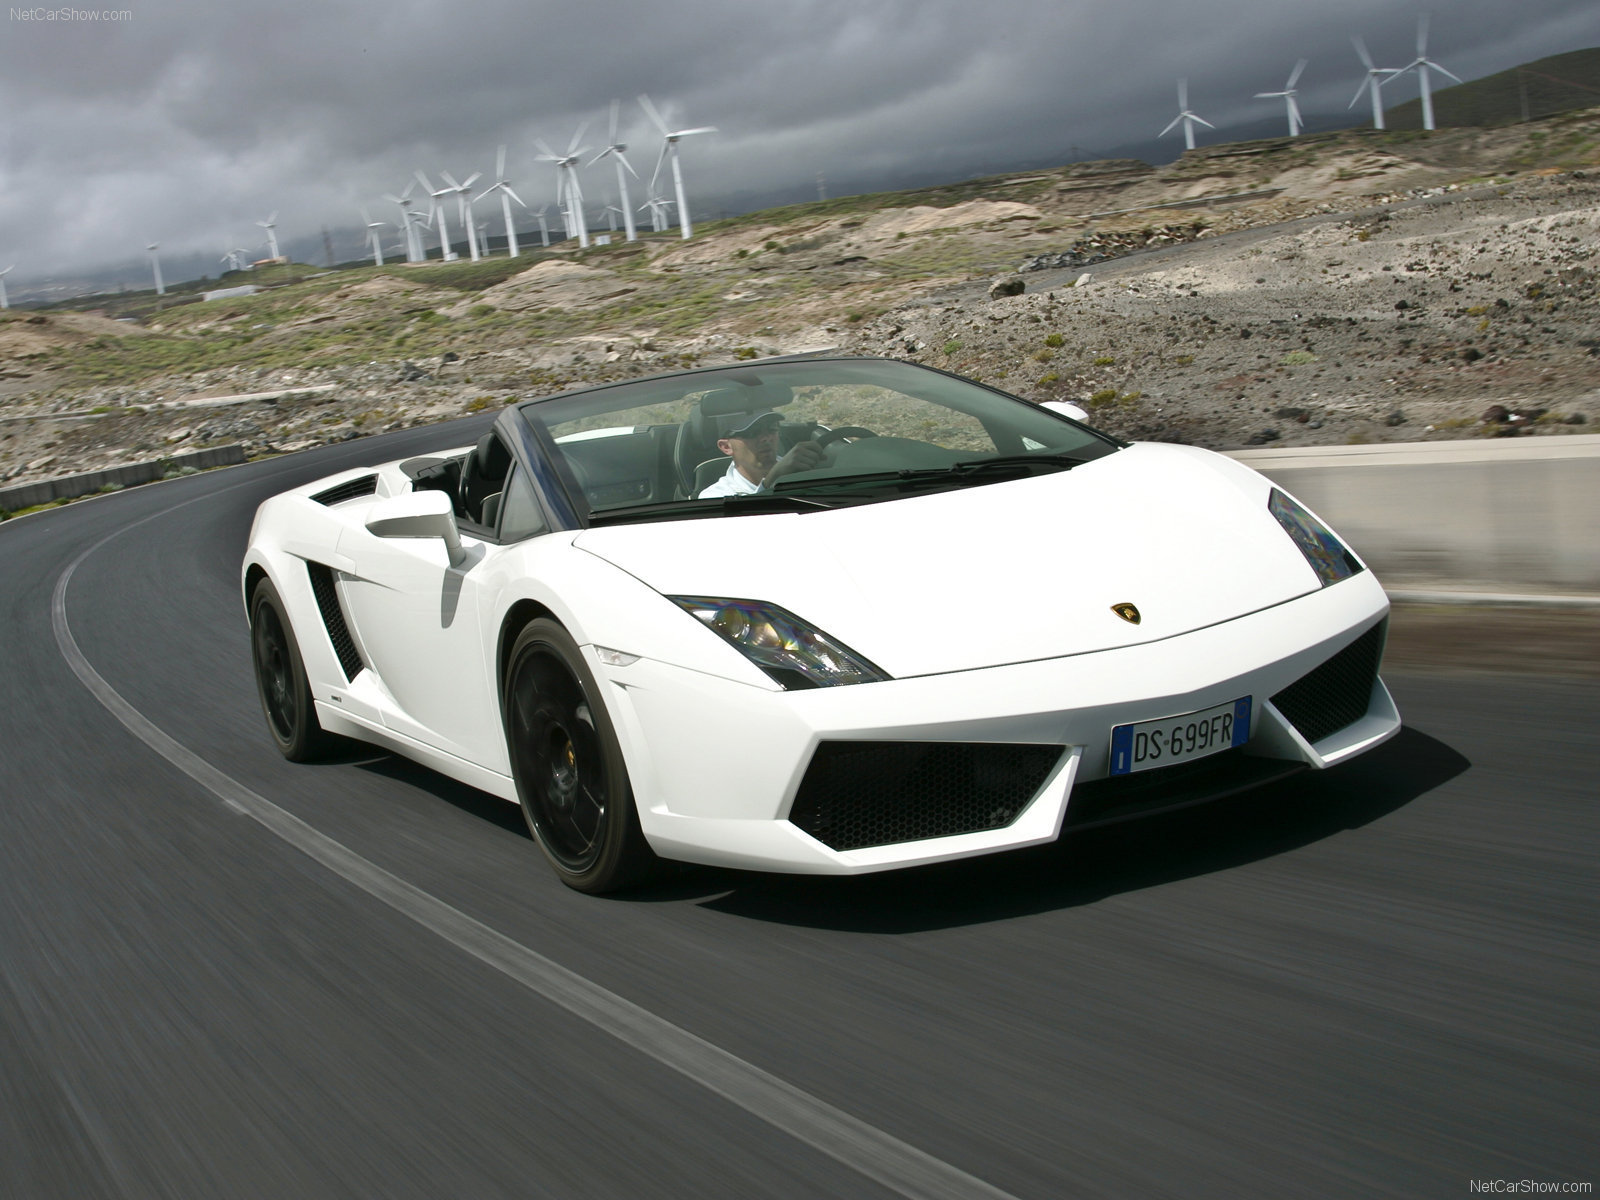 Lamborghini Cars WallpapersCool WallpapersFree WallpaperWhite WallpaperBlue WallpaperLamborghini